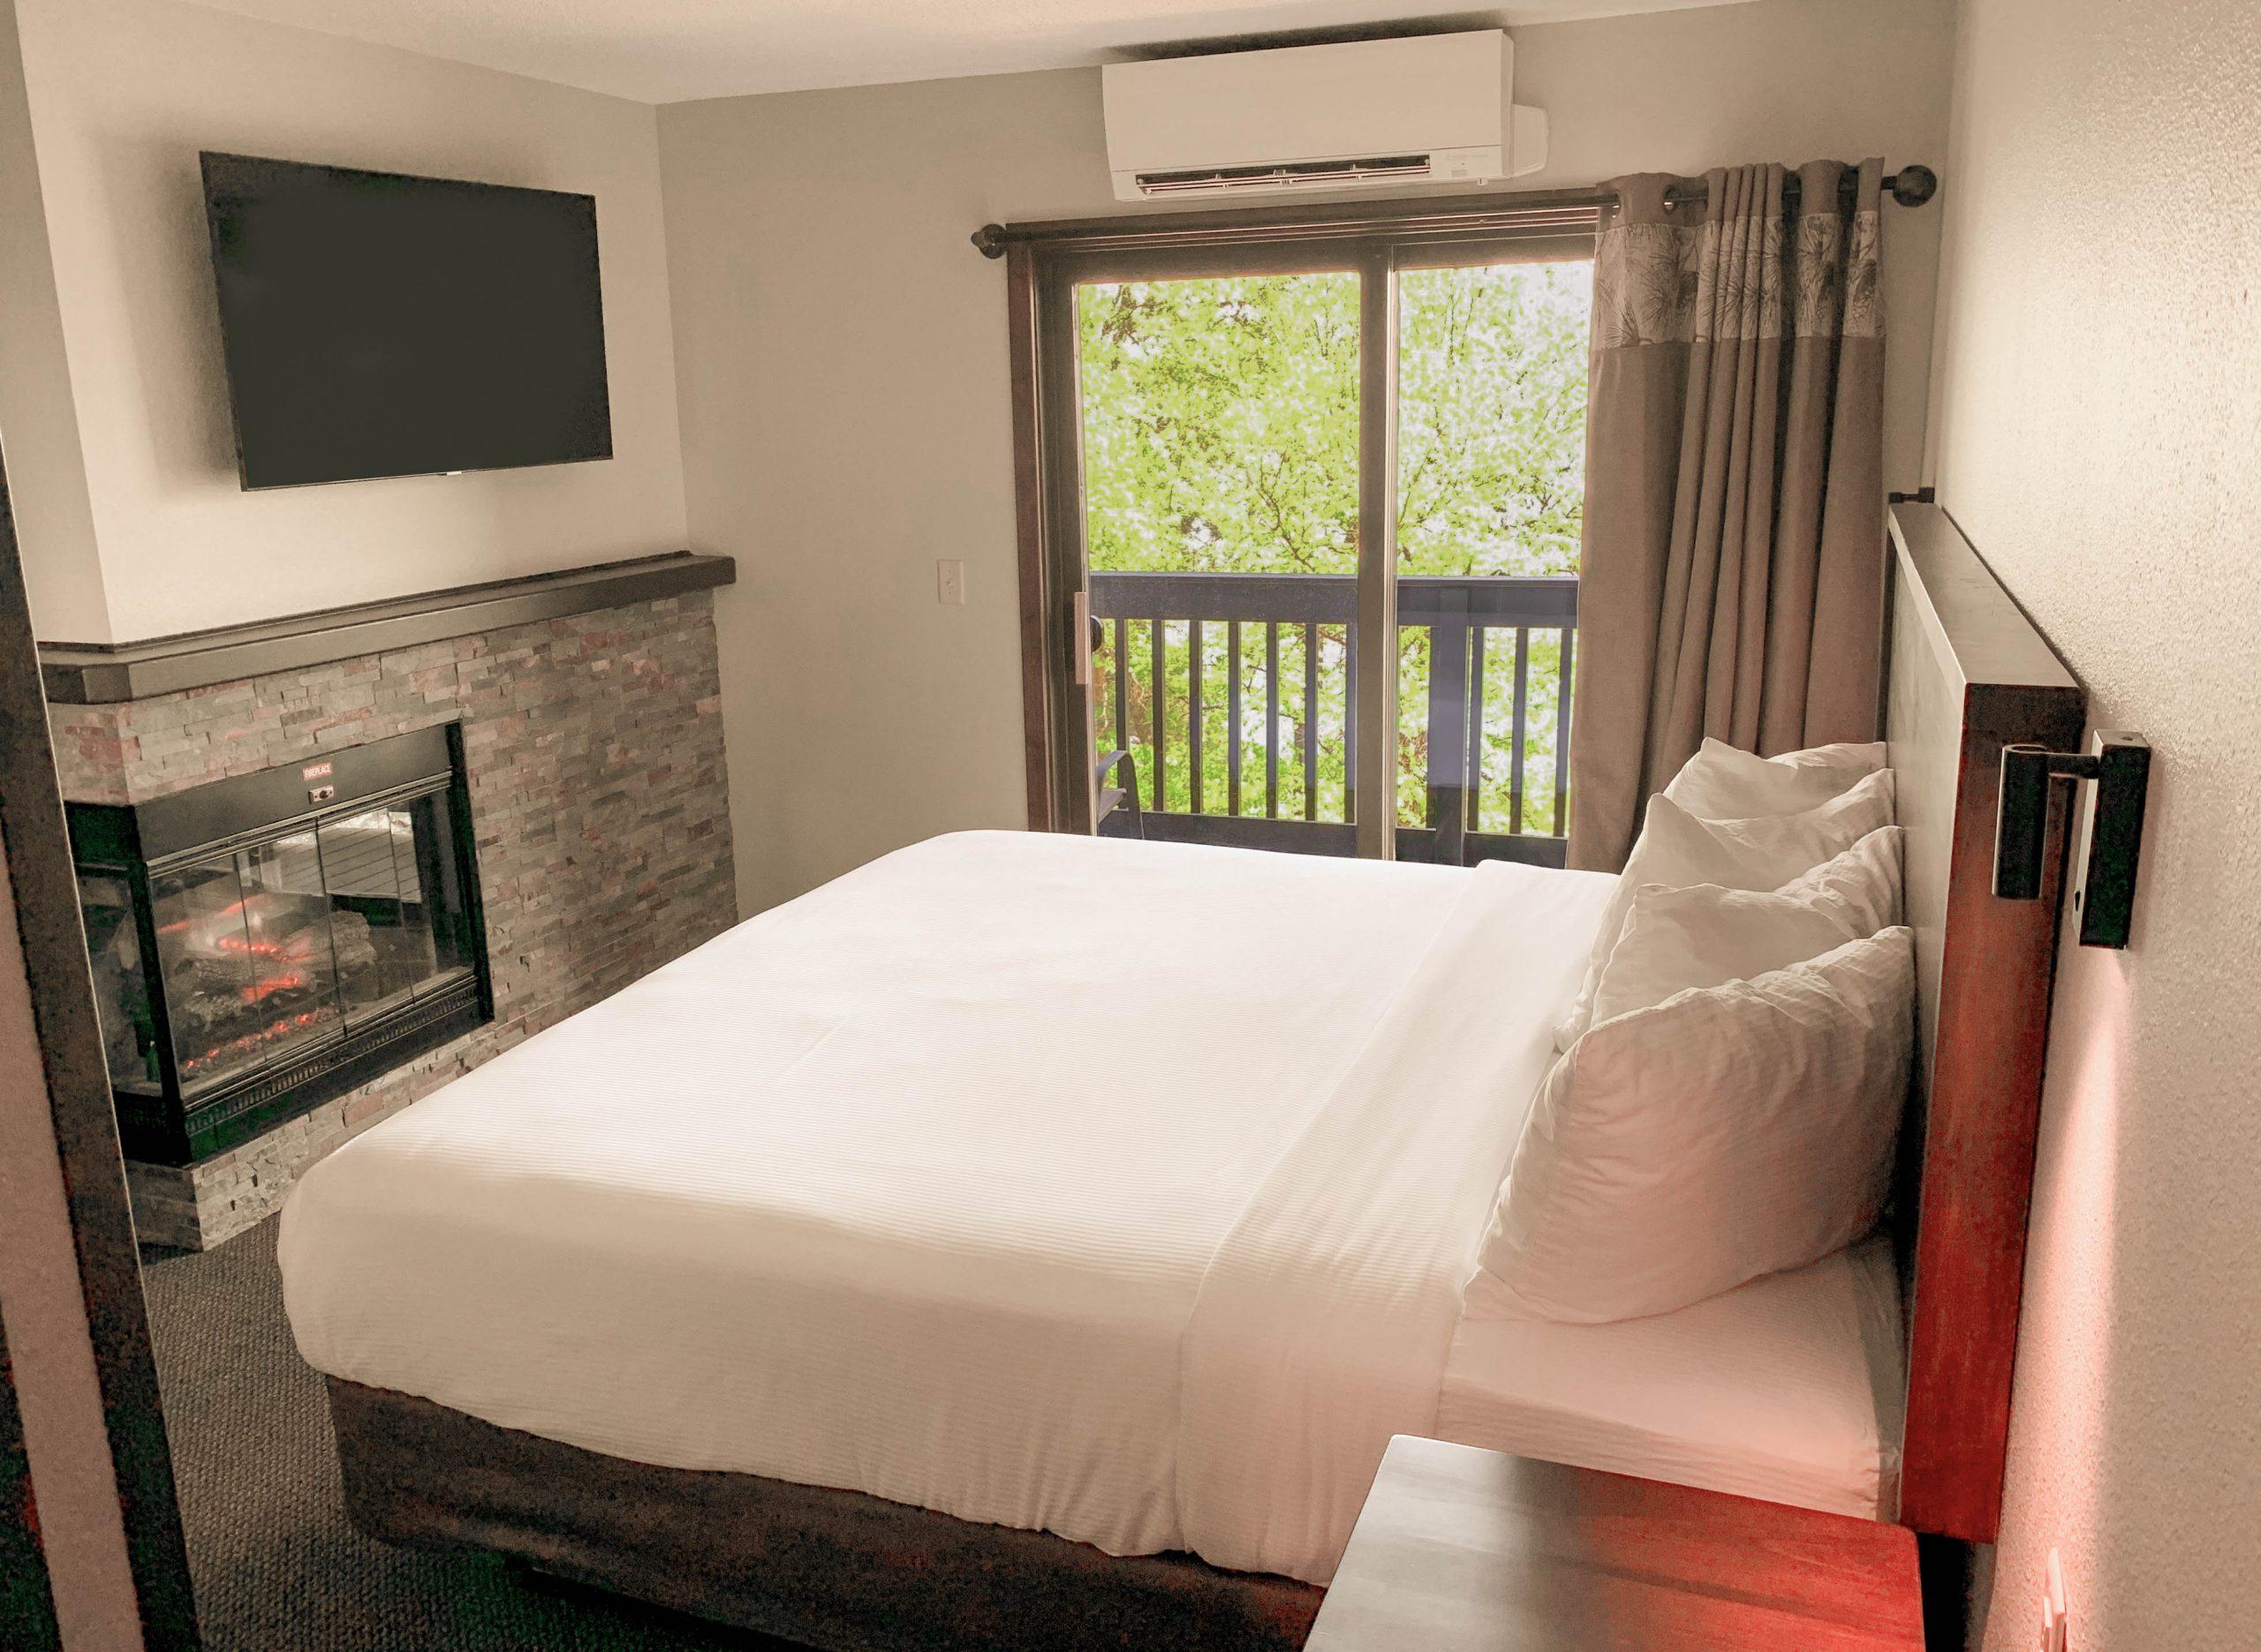 King Suites at Cragun's Resort, a leading Minnesota resort